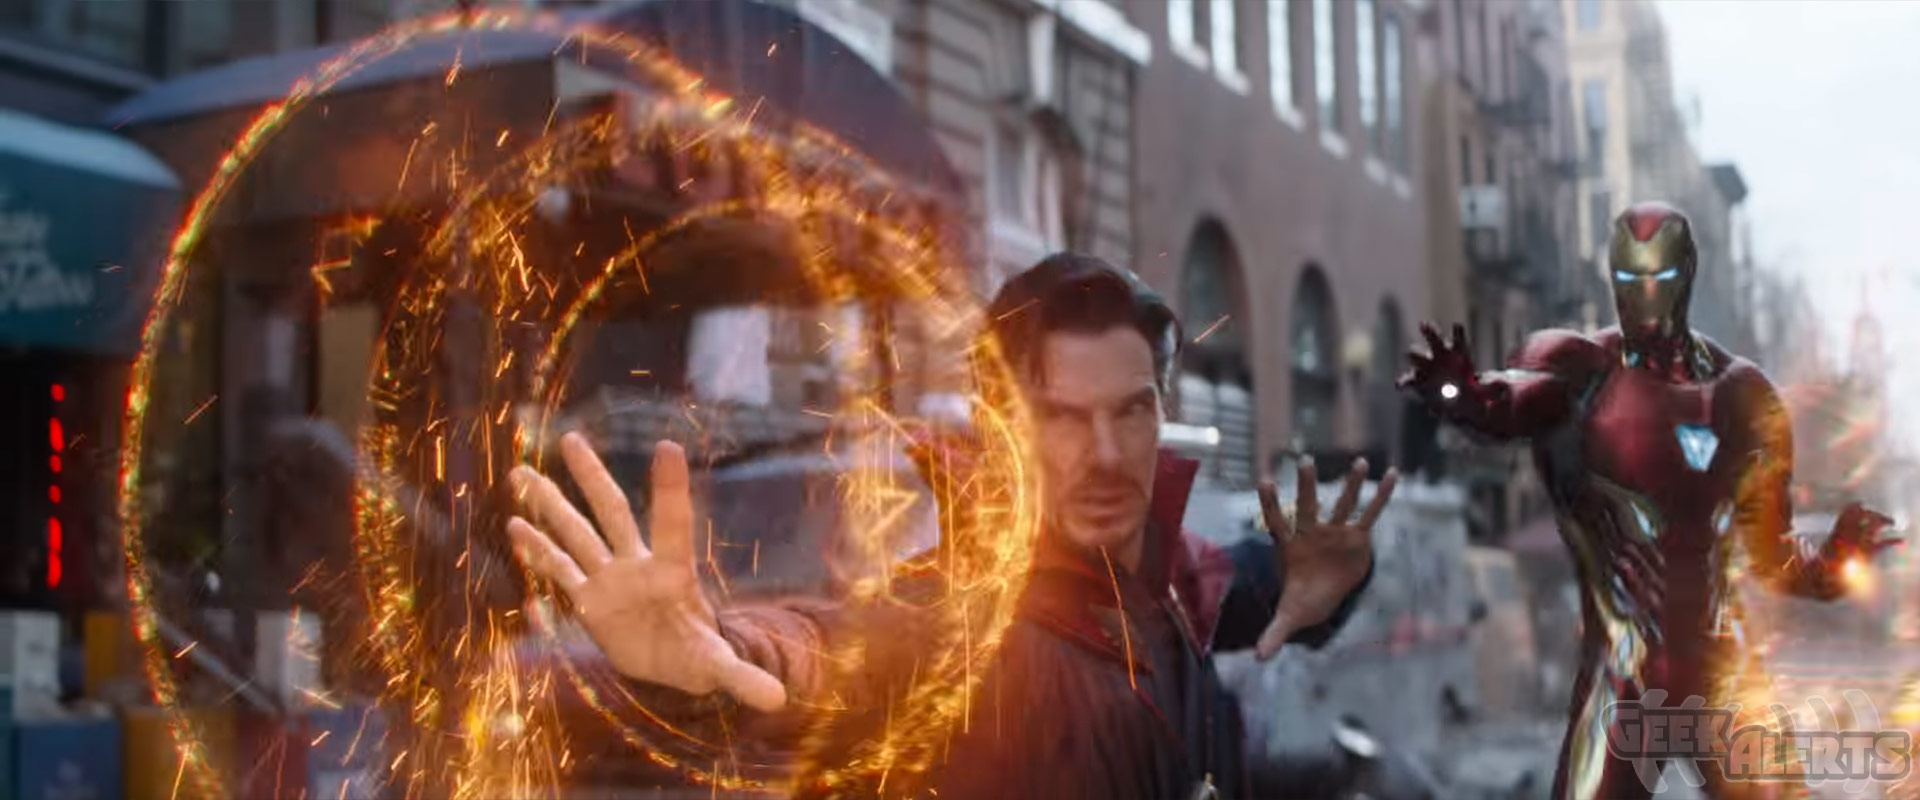 Avengers Infinity War Streaming